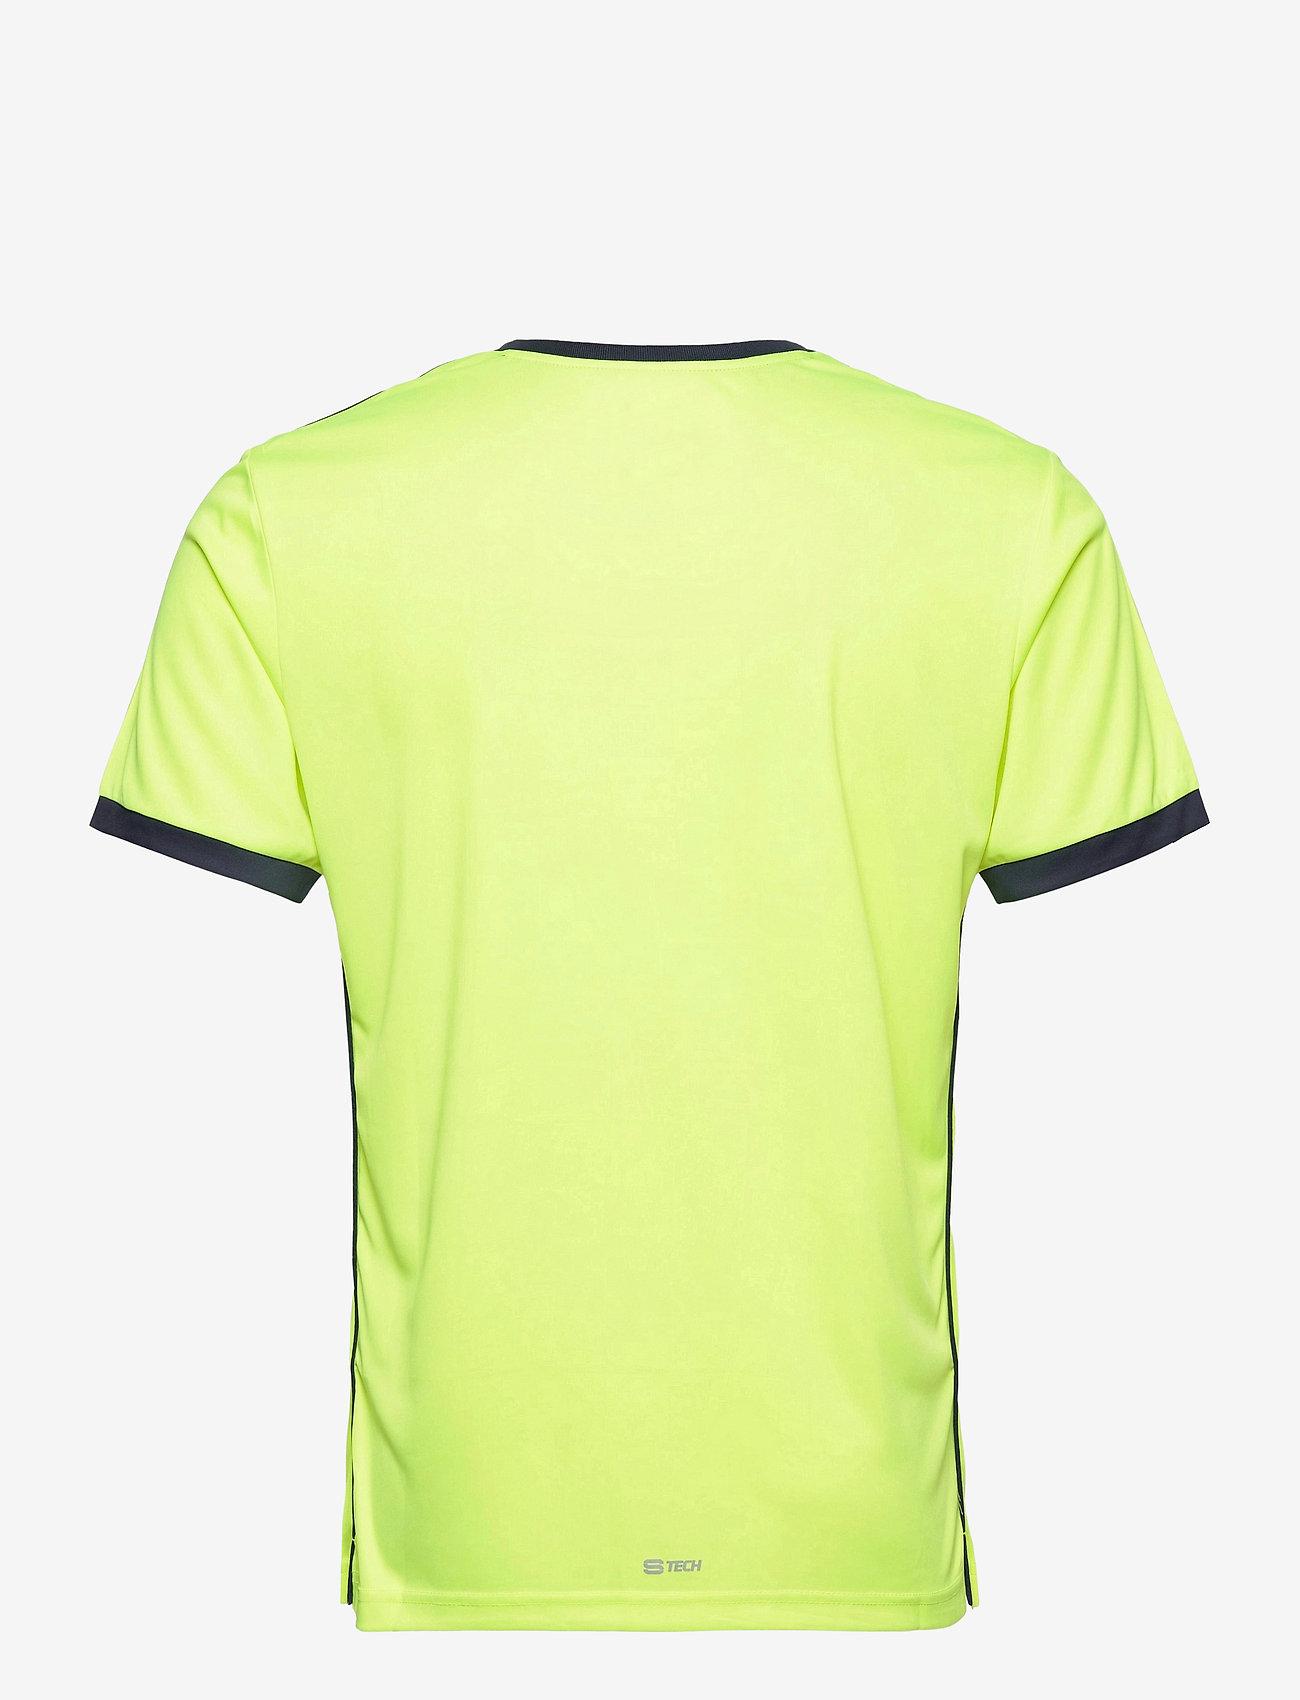 Sergio Tacchini - CLUB TECH T-SHIRT - t-shirts - yellowflou/black - 1